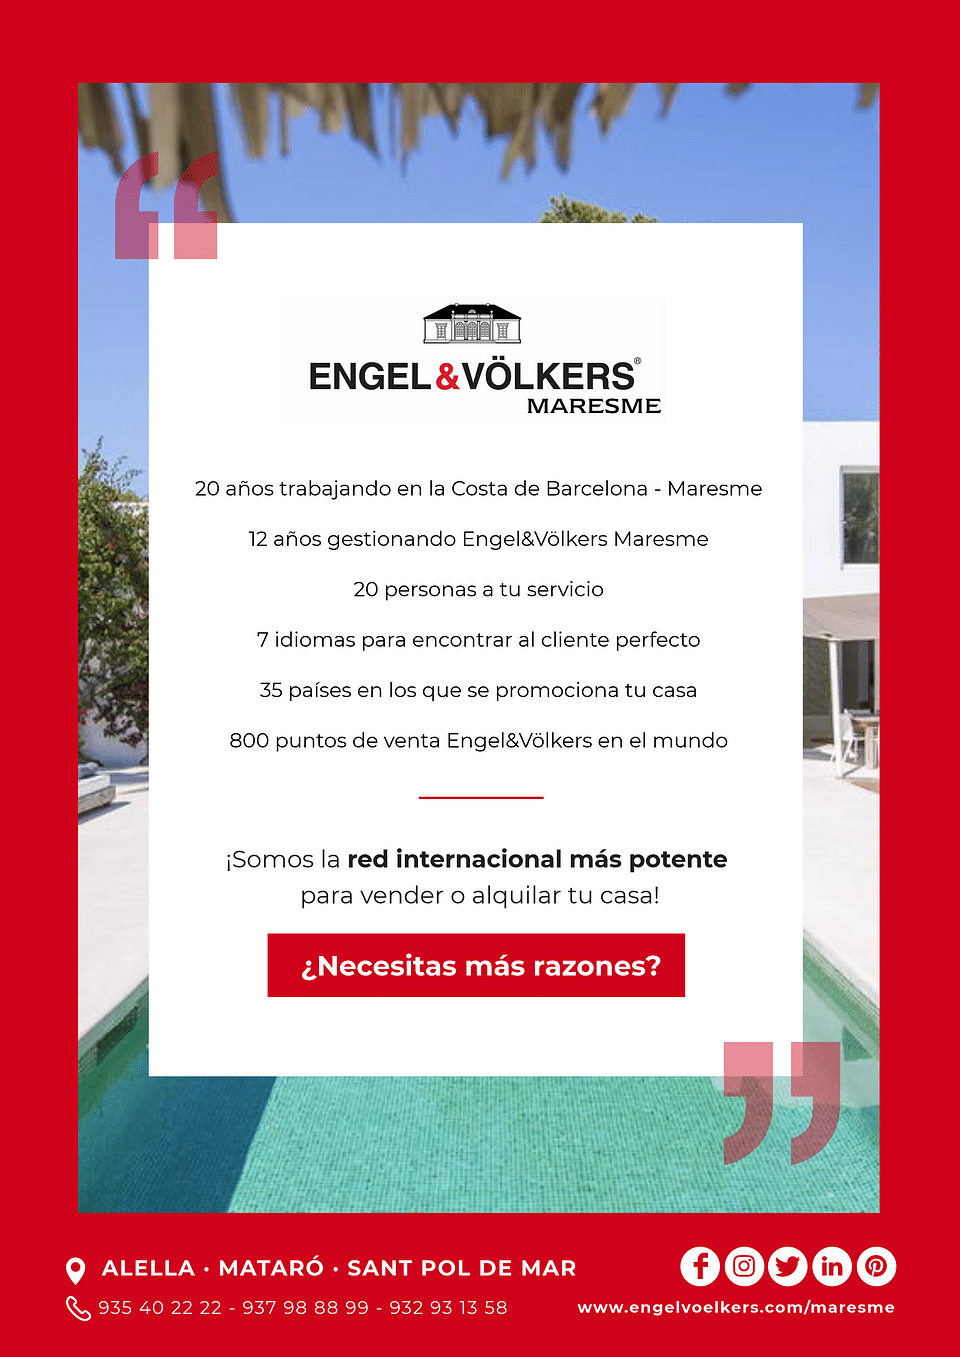 Gestion de la cuenta de Engel & Voelkers